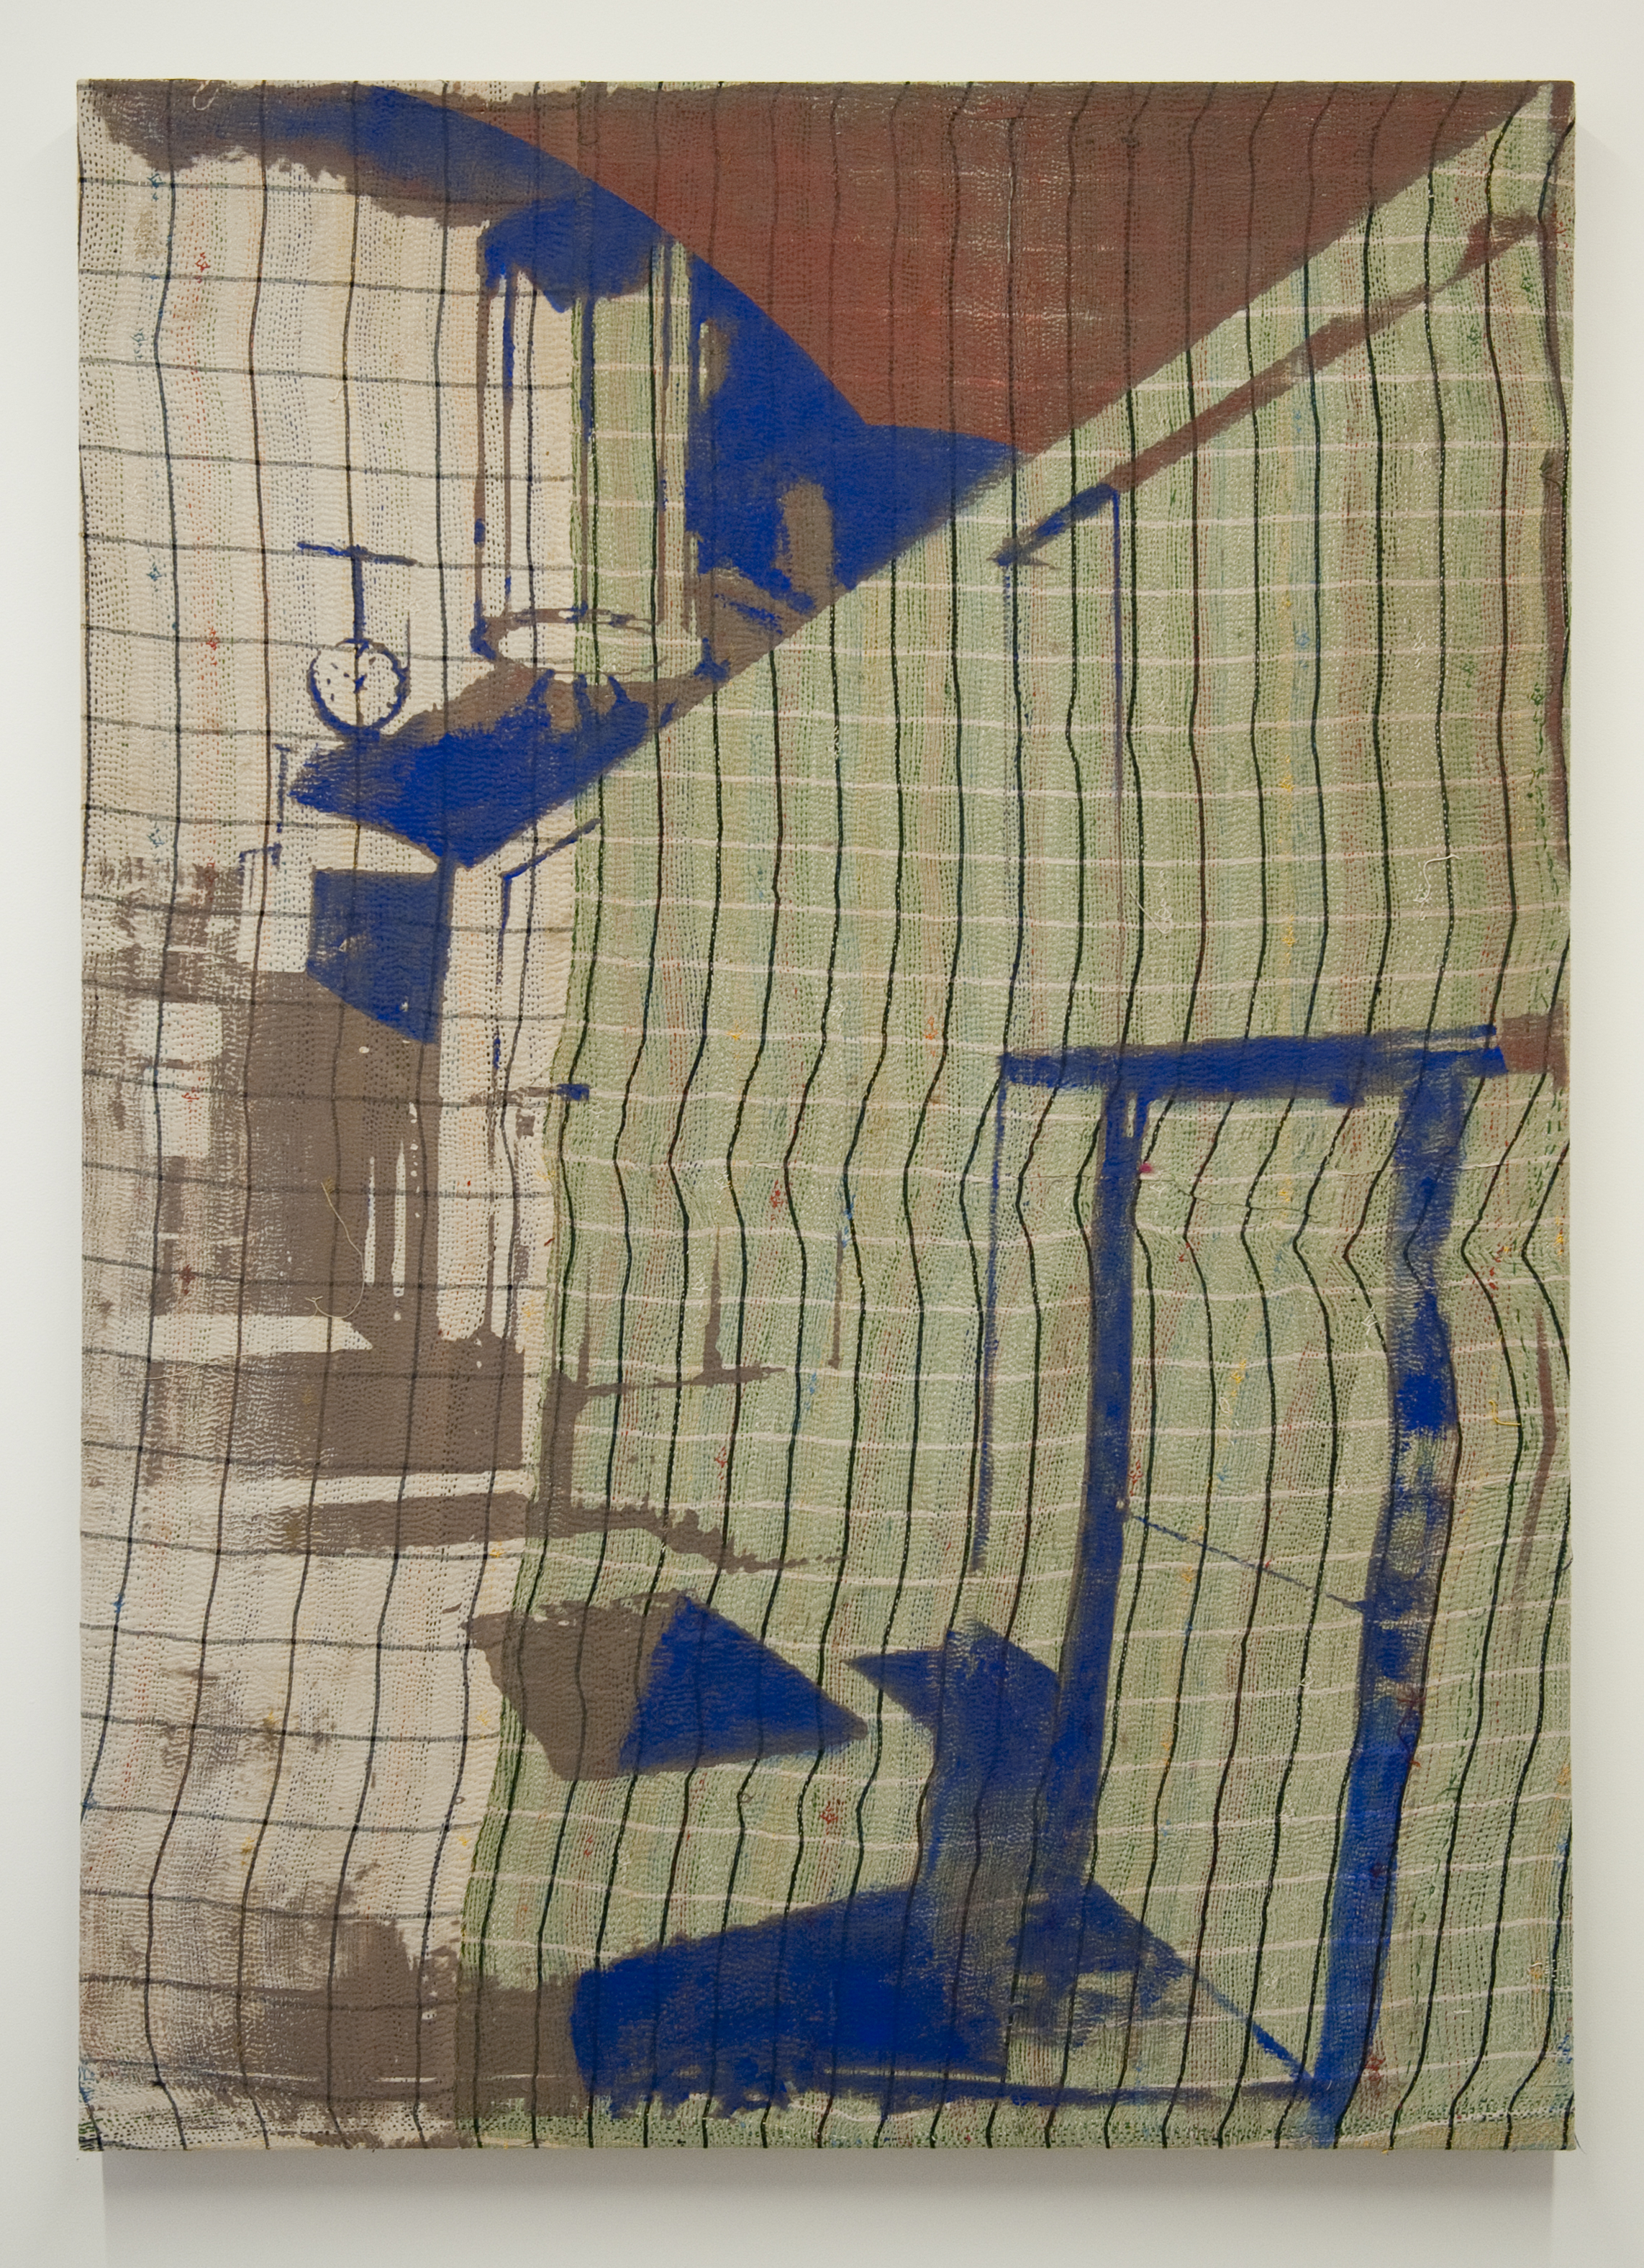 Shezad Dawood   PC001 , 2016 acrylic on vintage textile 55.12 x 38.98 inches 140 x 99 cm